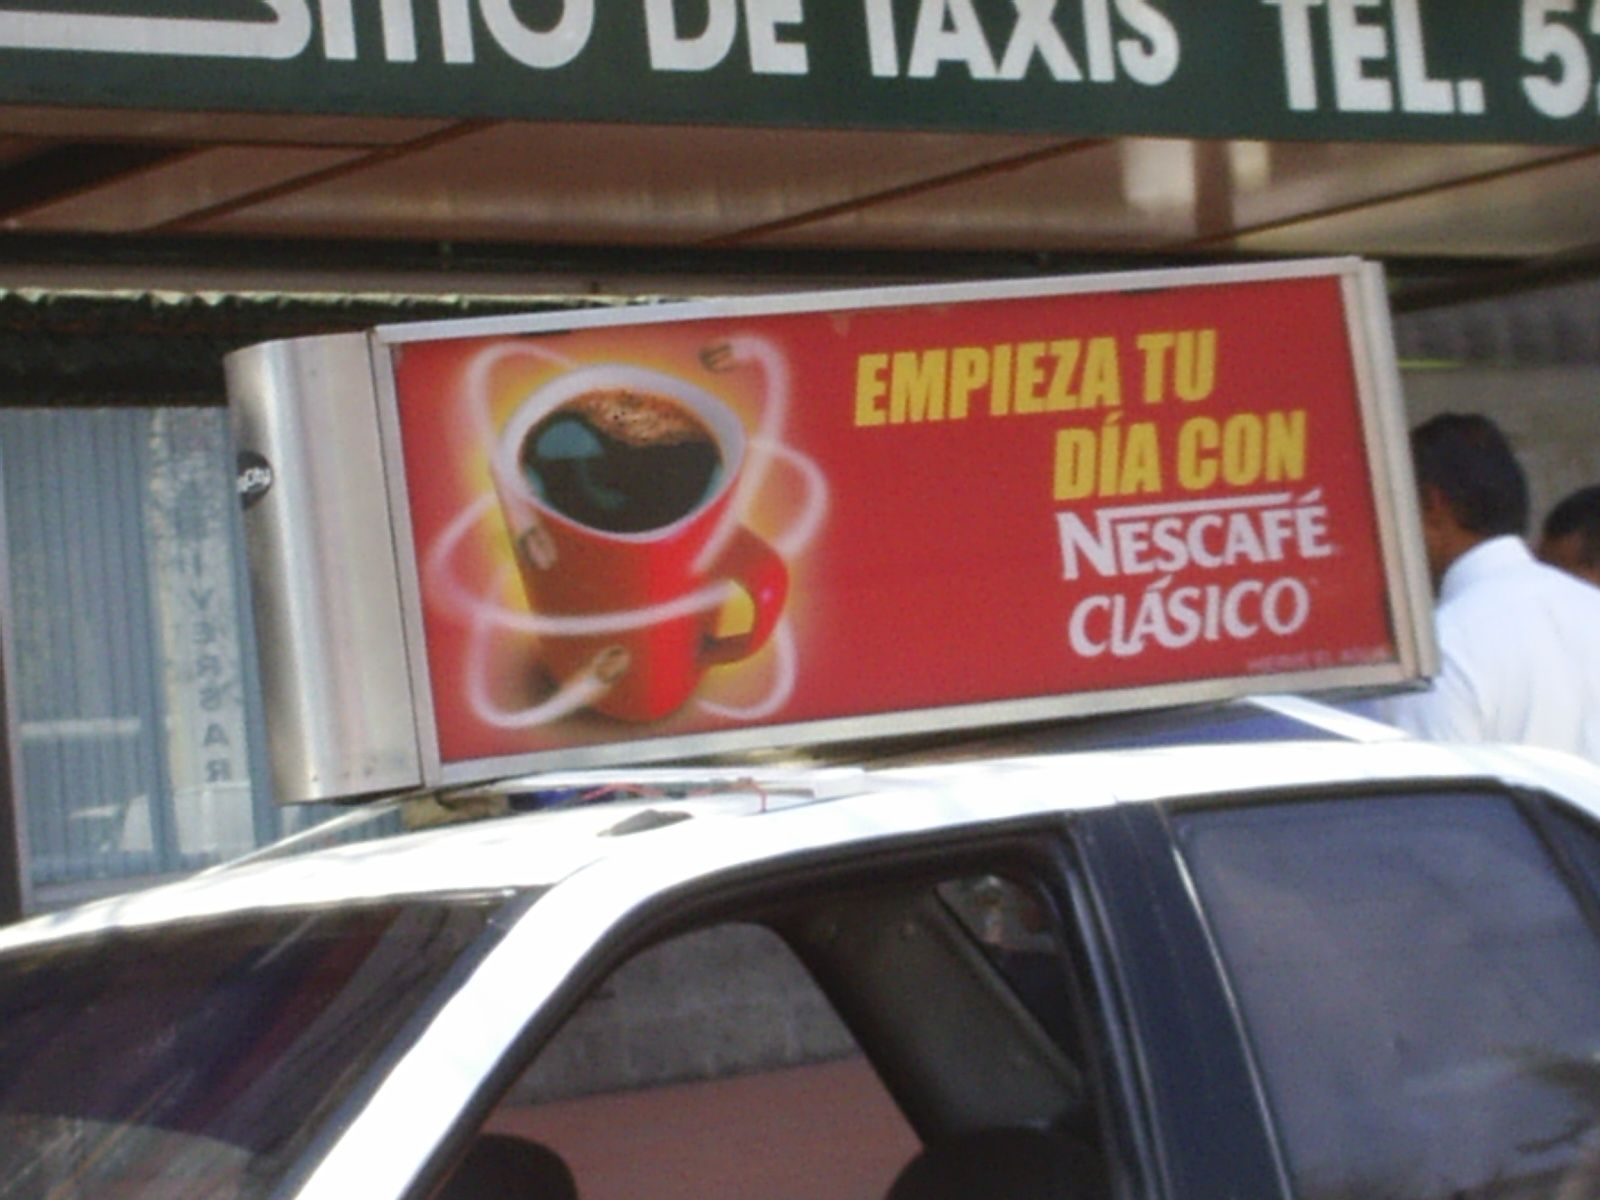 Nescafé Clássico - Cidade do México